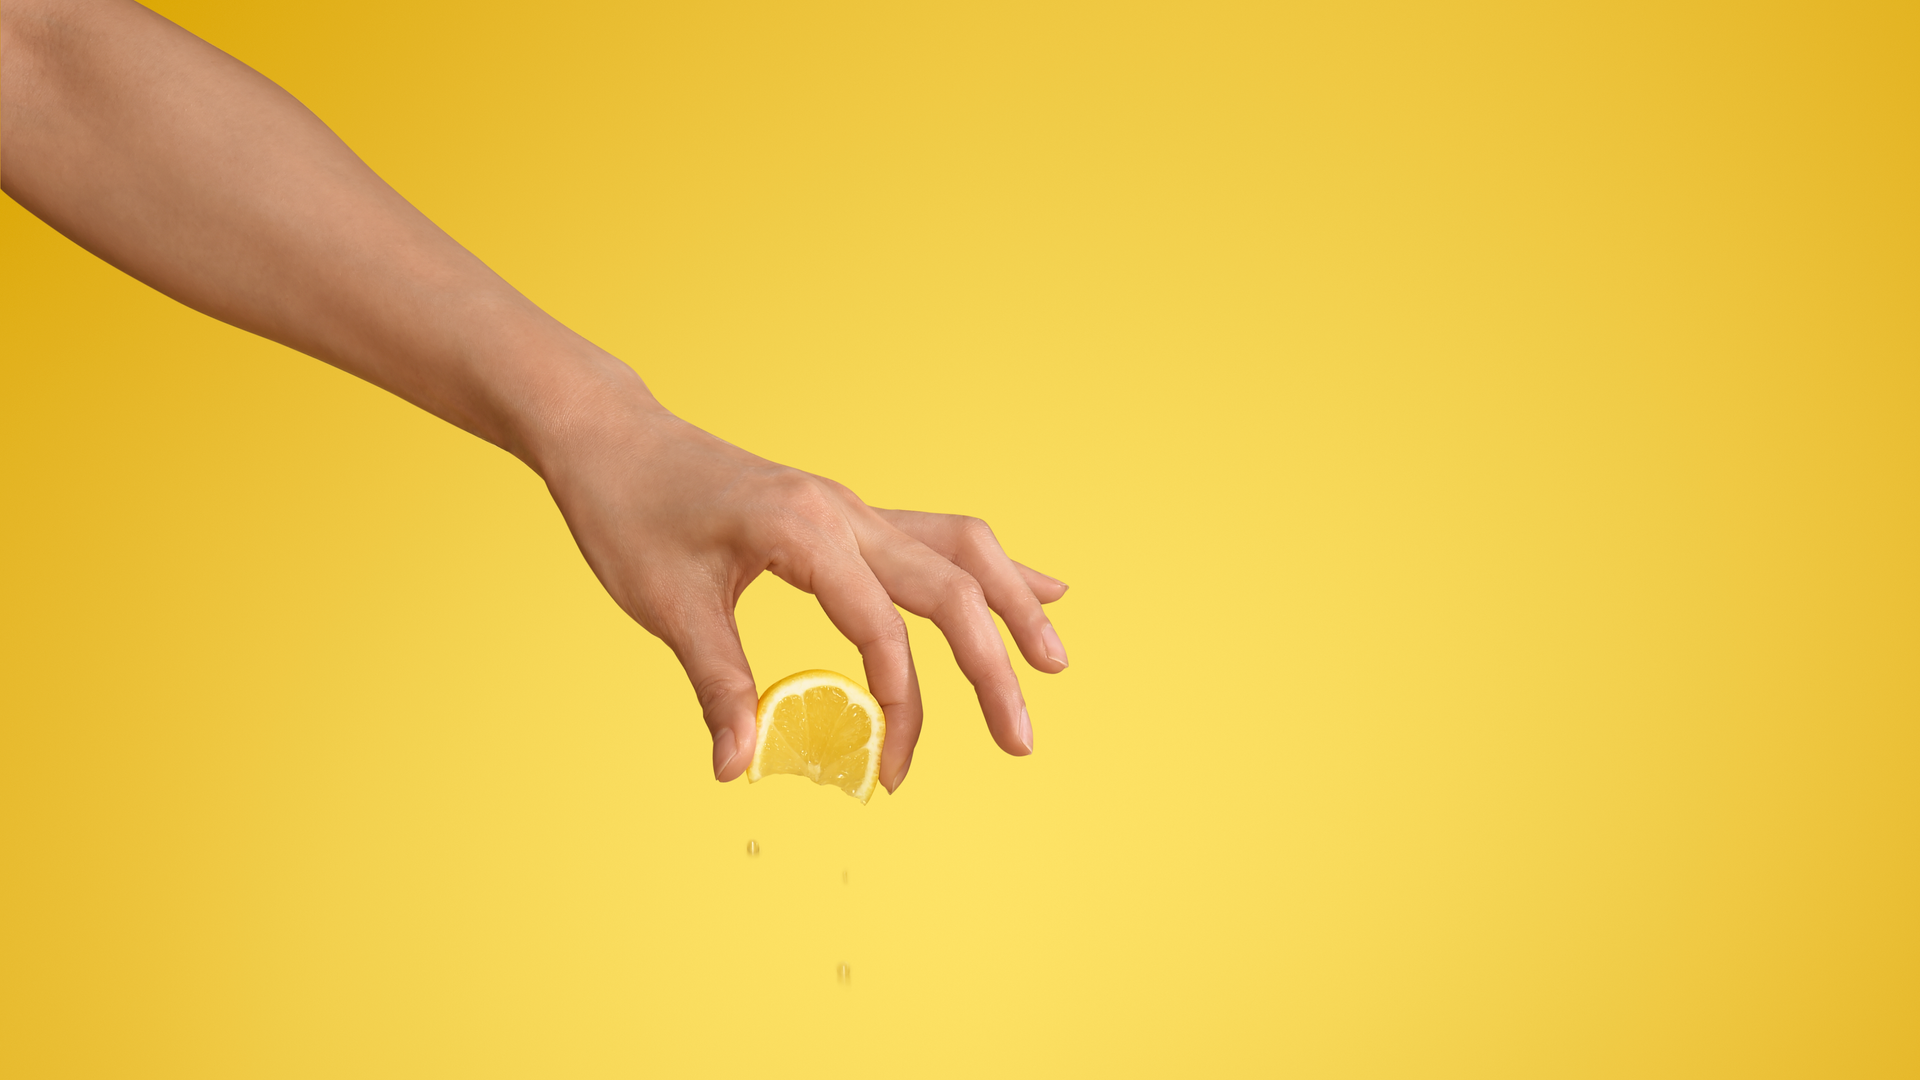 SUNK_2019_Lemon_28_R1.tif